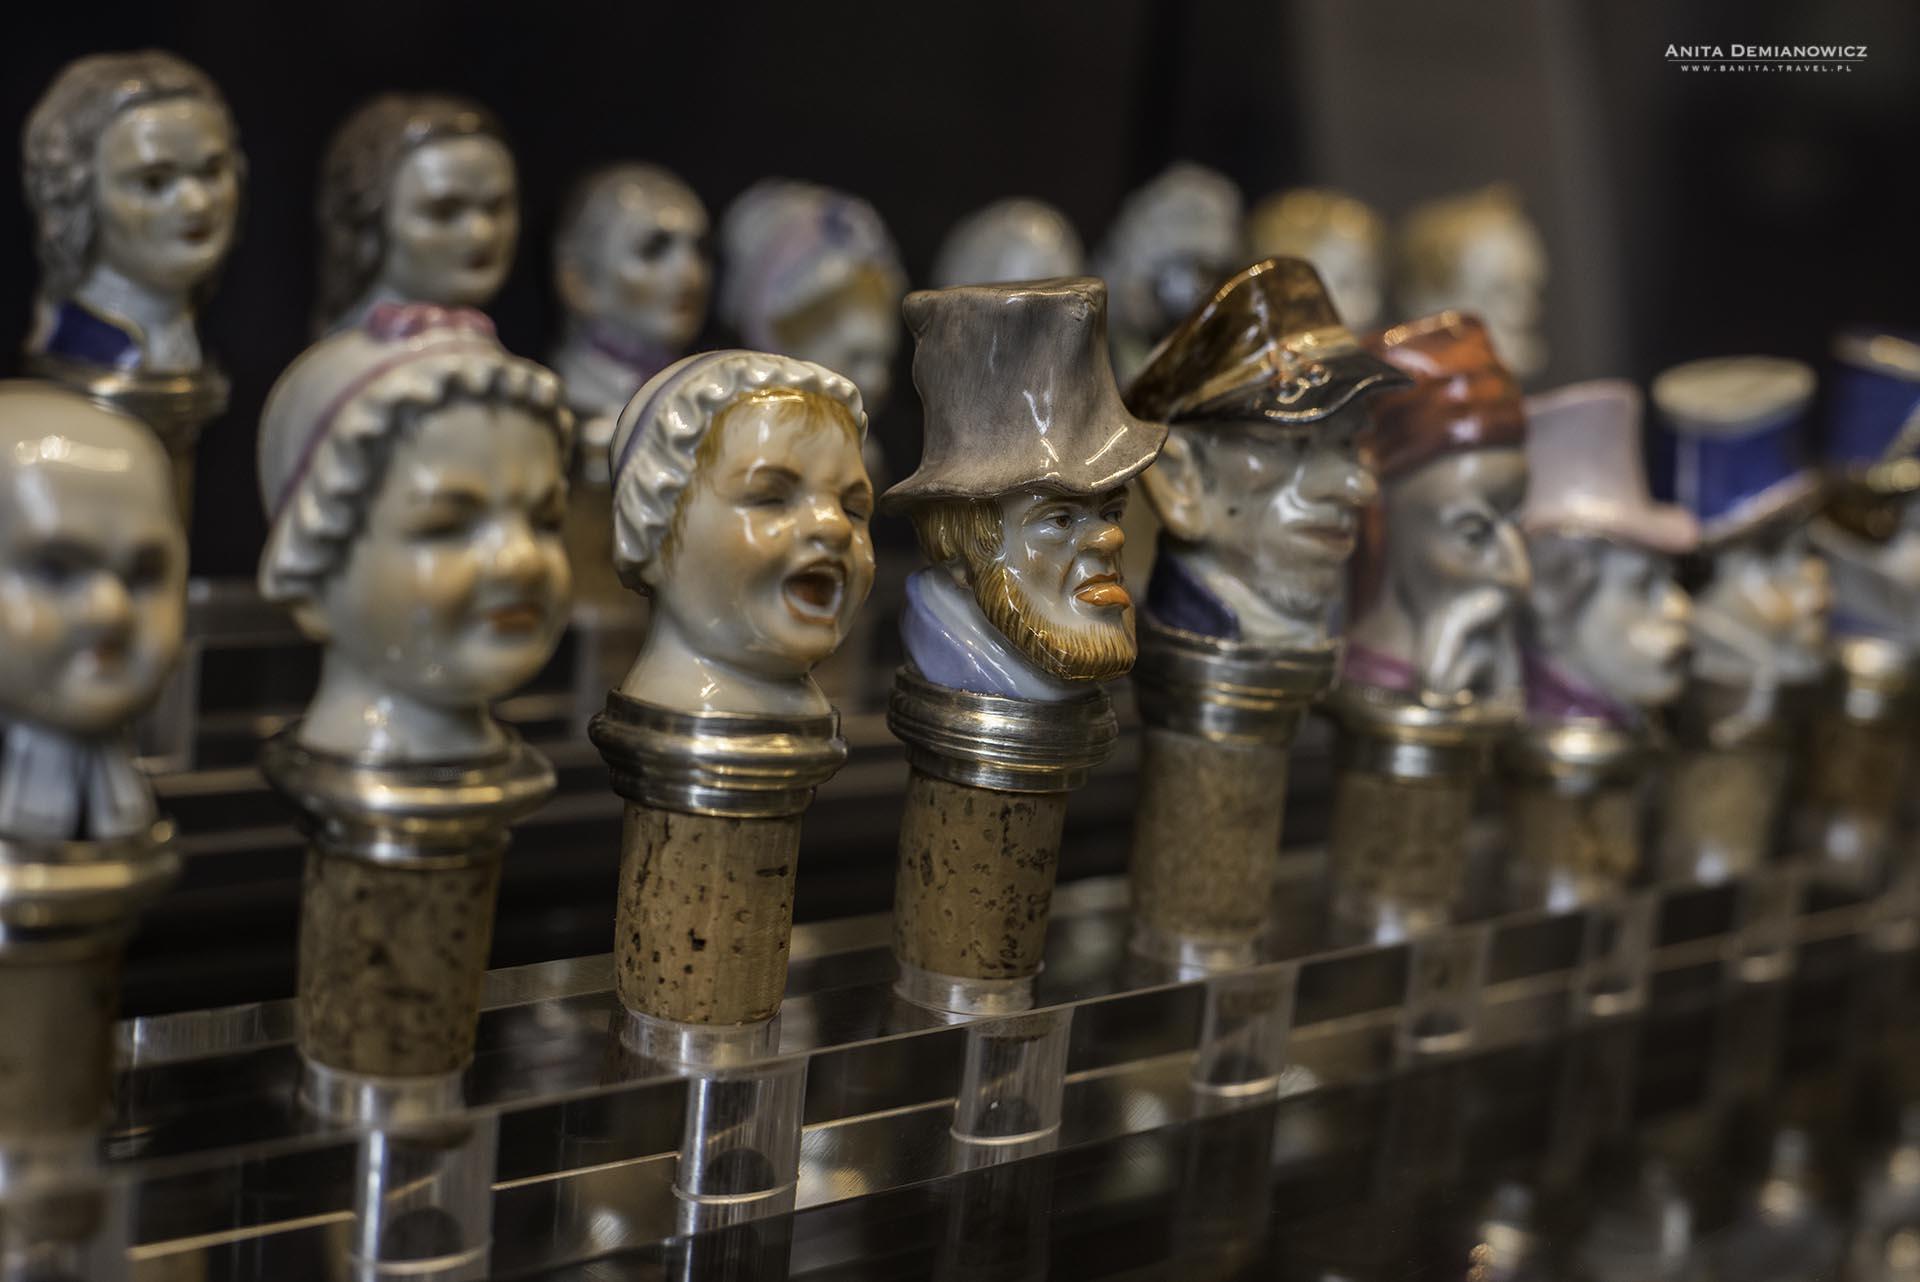 Manufaktura porcelany, Miśnia, Saksonia